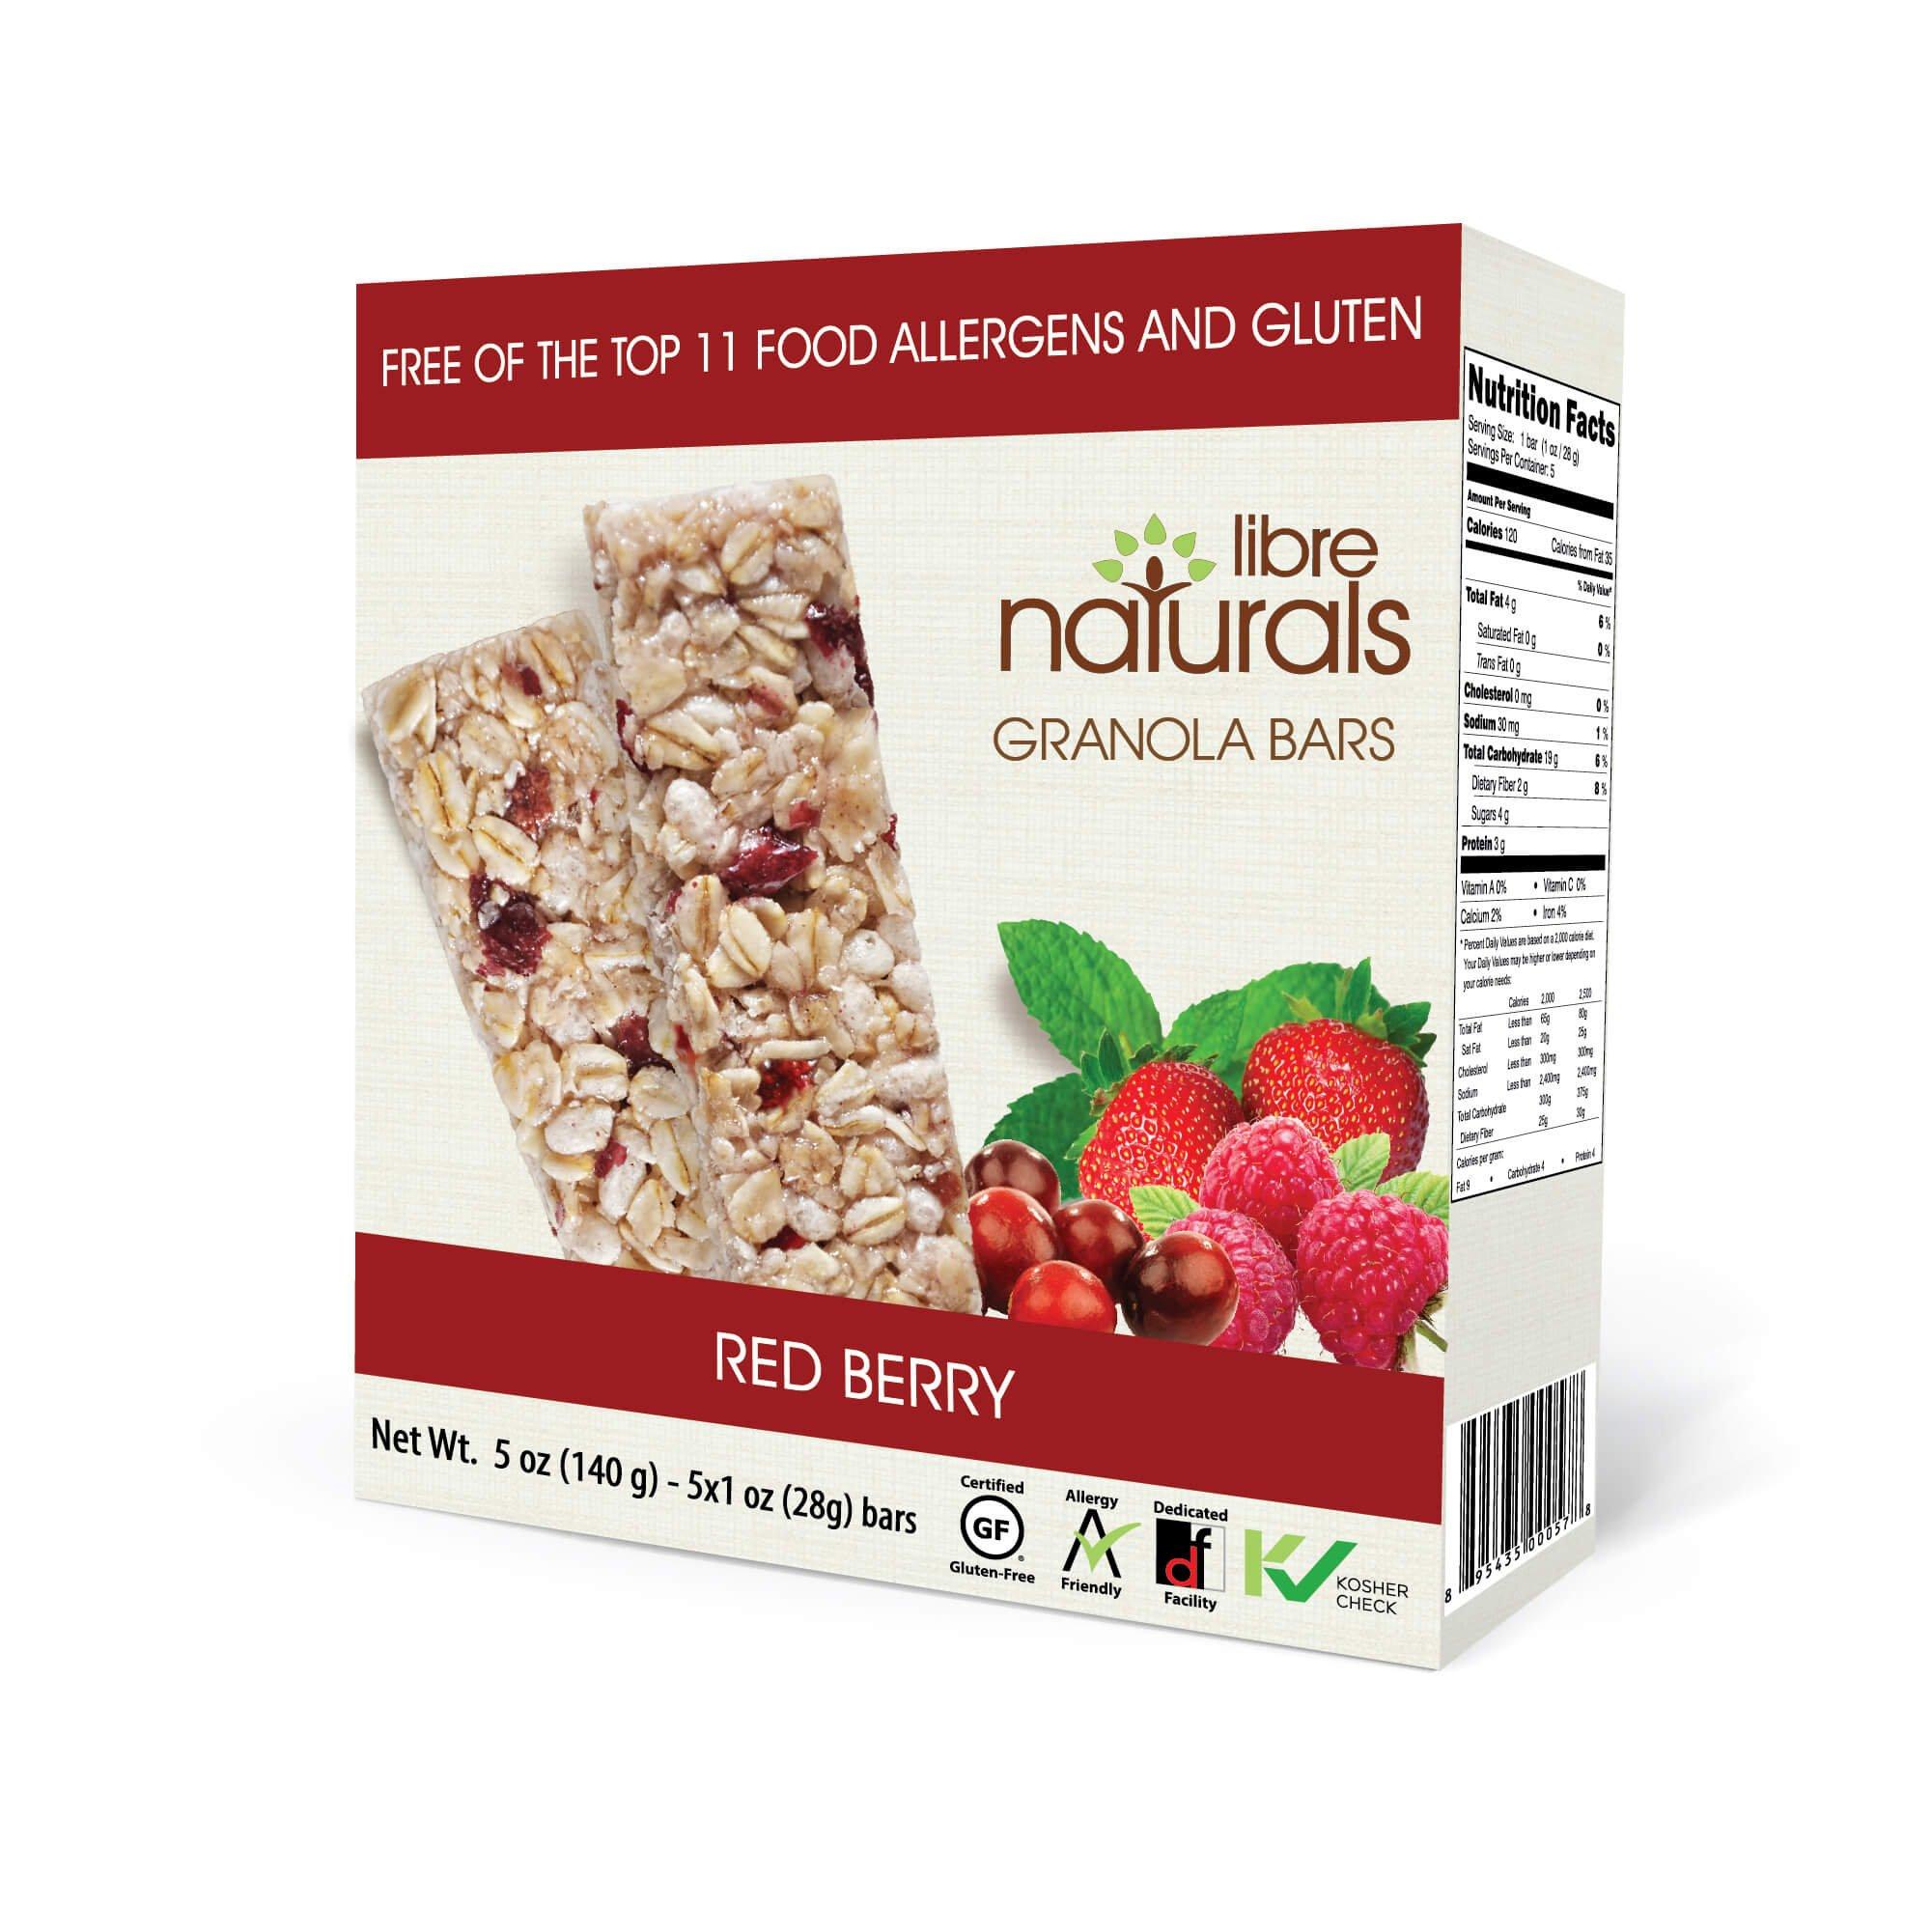 Nut Free, Gluten Free >> Red Berry Vegan Granola Bar - Libre Naturals, 28 gram, 5 pack x 6 (30 Bars)